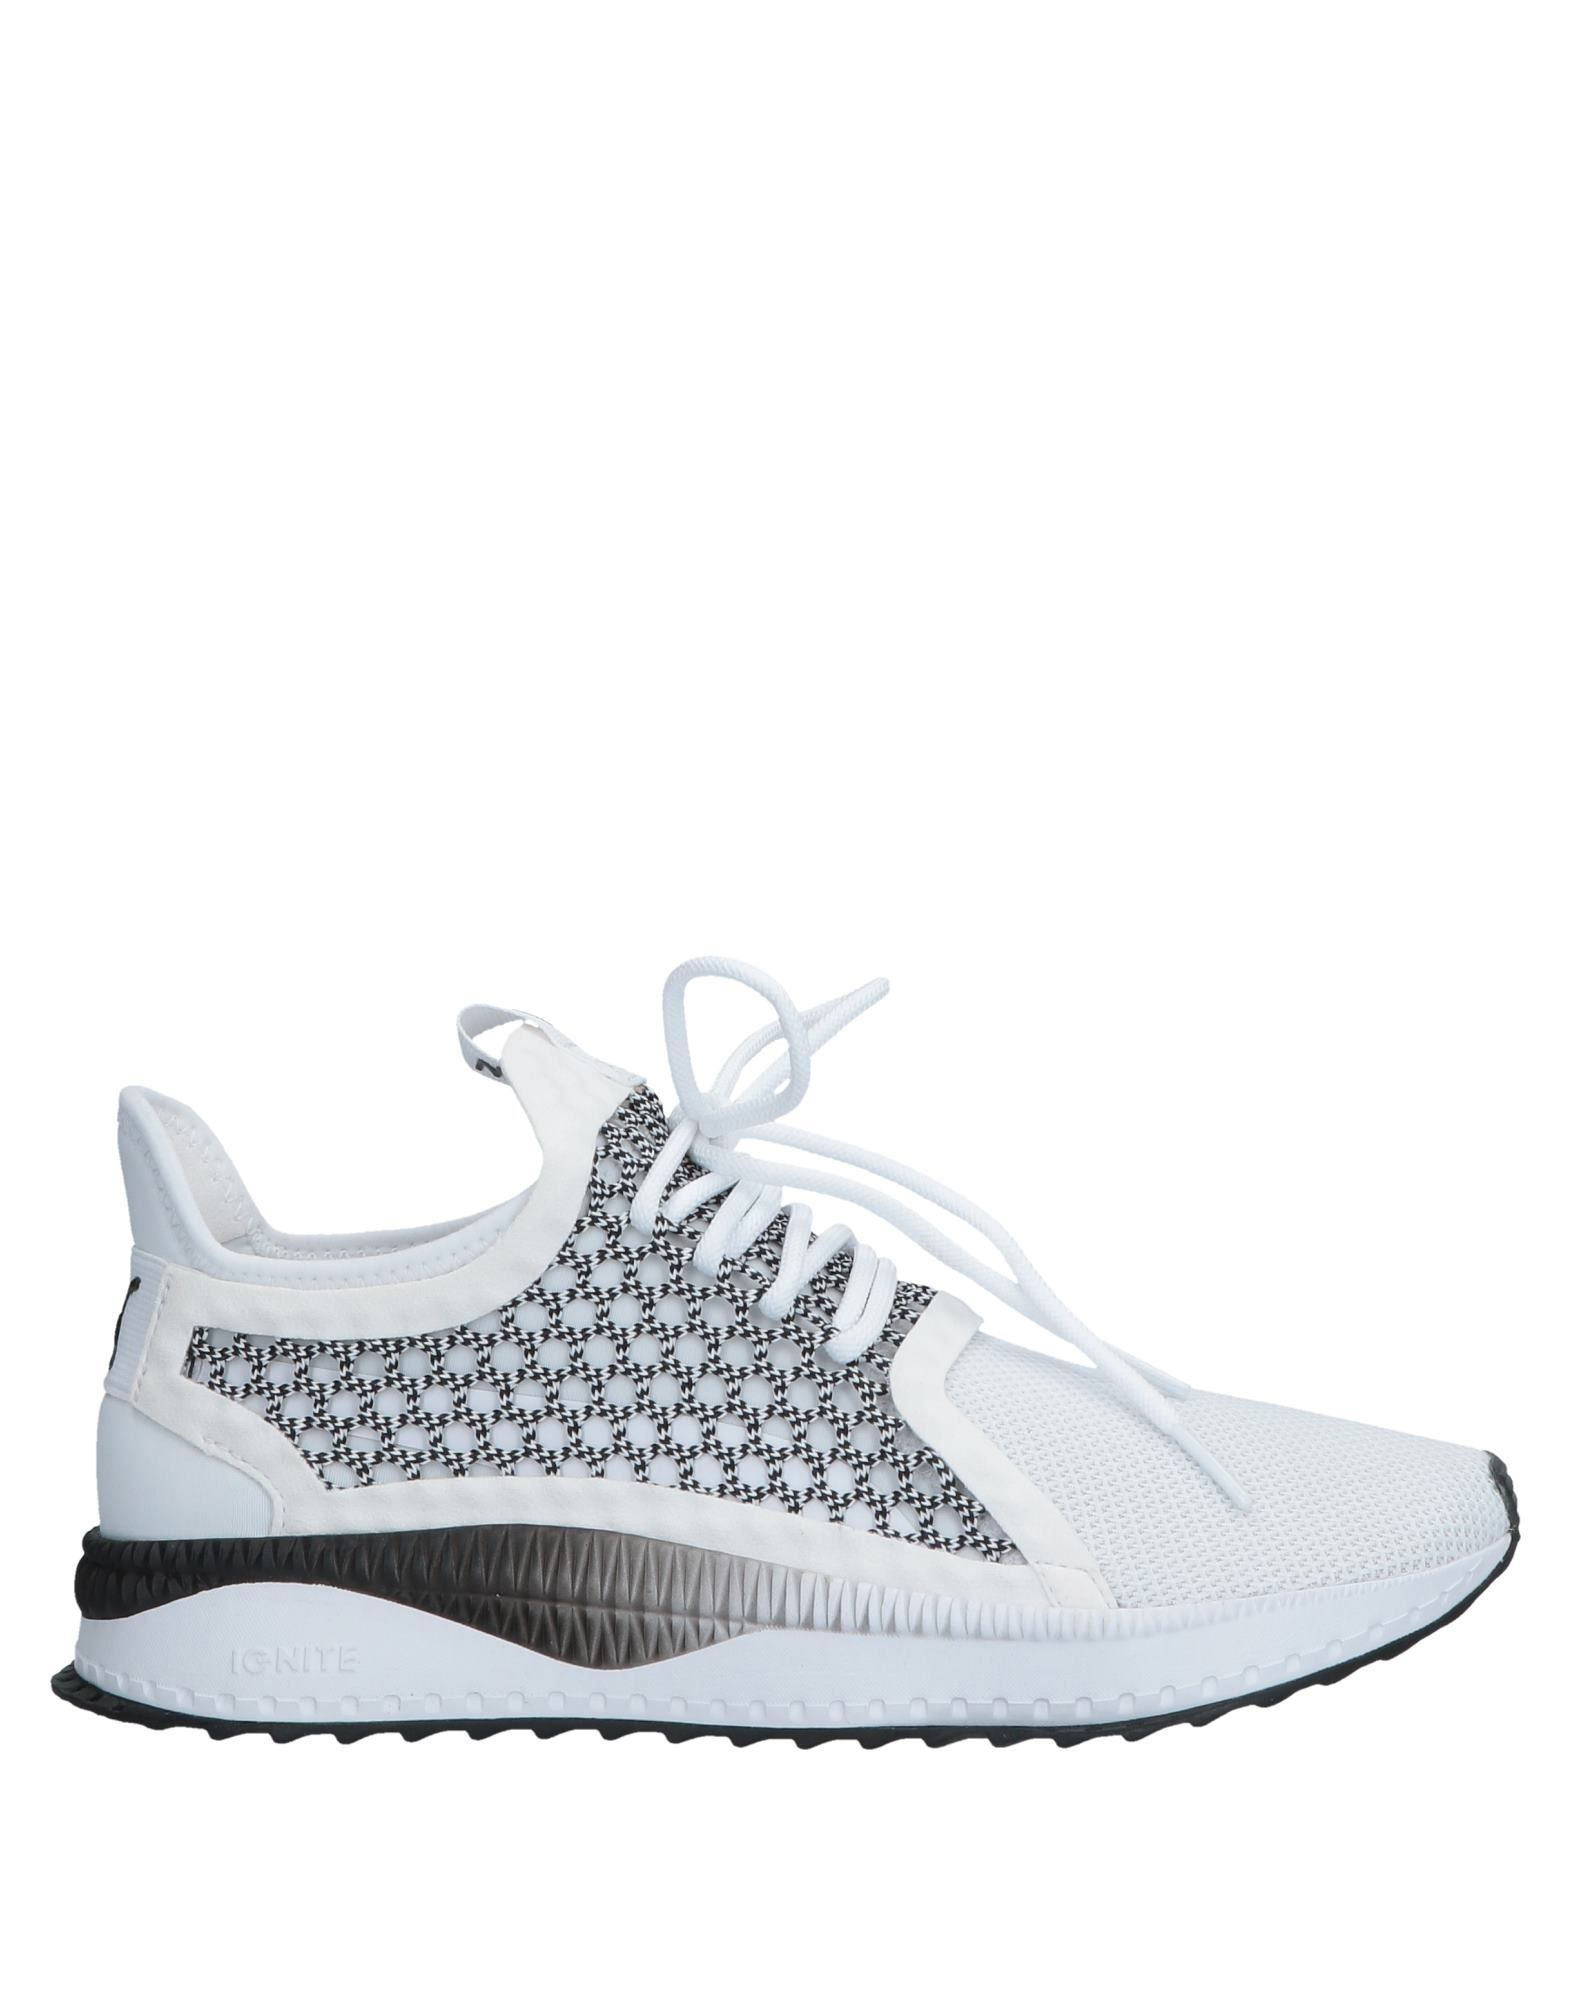 Puma Sneakers - Men  Puma Sneakers online on  Men Australia - 11559144CC 85d8c8